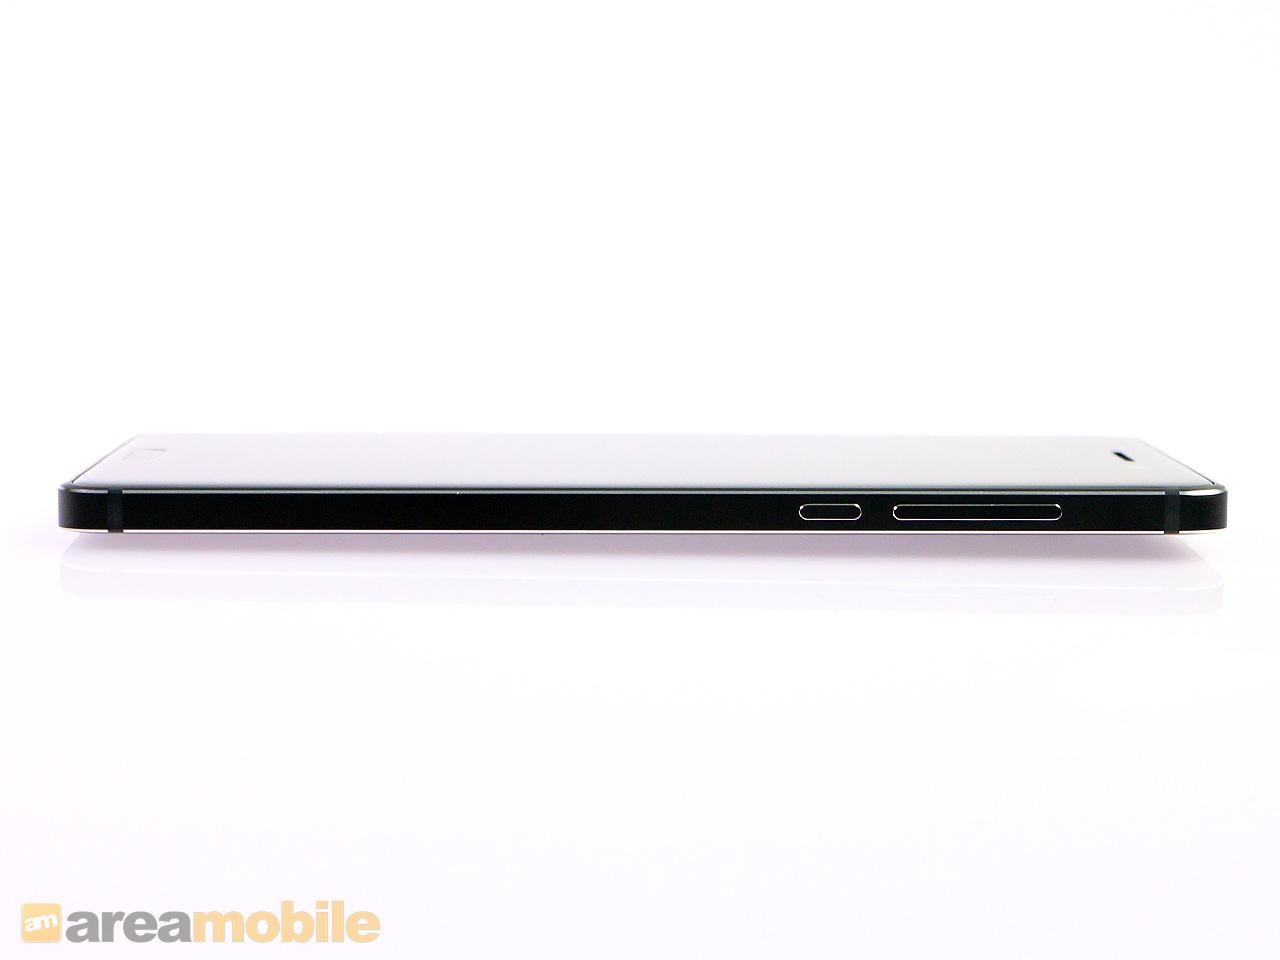 Nokia 6 im Test: Android-Smartphone mit Nokia-Nimbus - Das Smartphone ist 8 mm dick. (Bild: Areamobile)